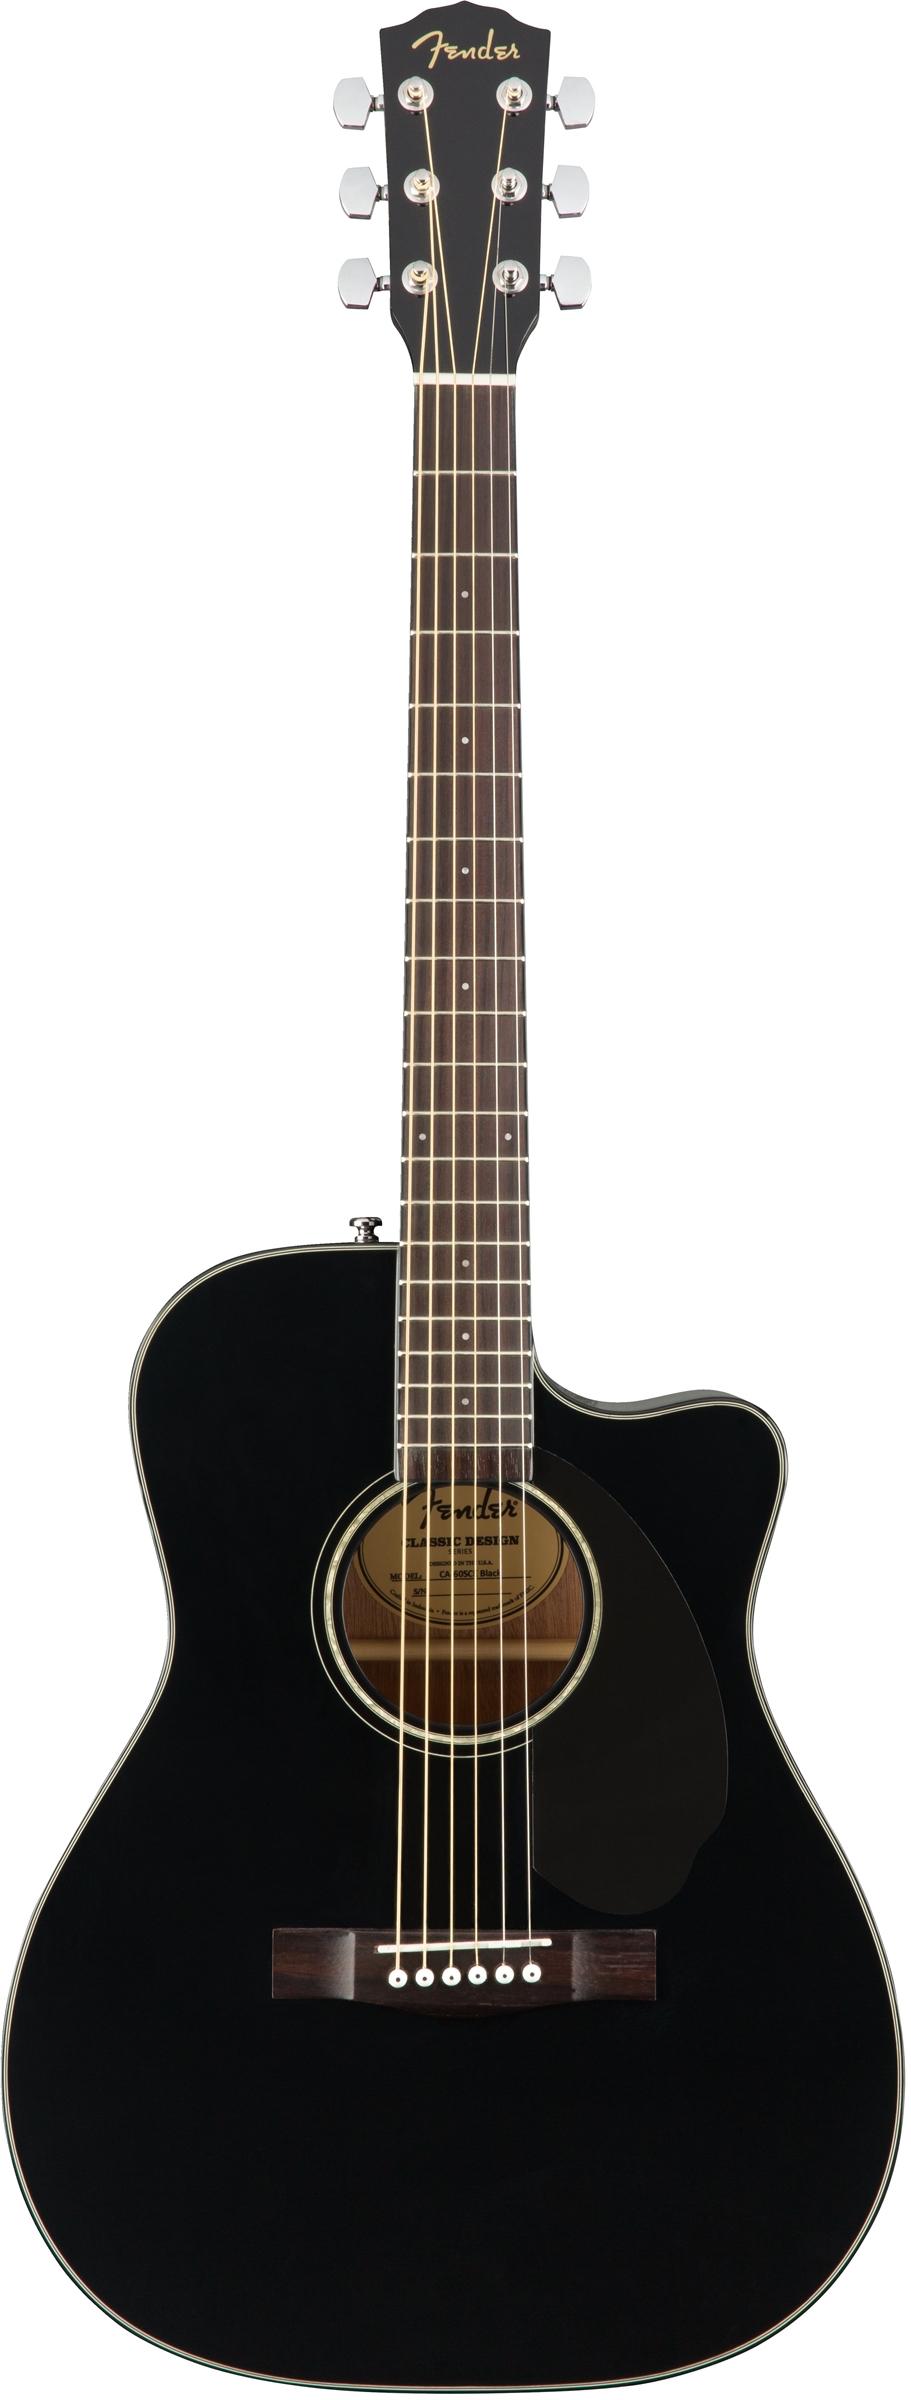 Fender CC-60SCE 6 String Acoustic-Electric Guitar